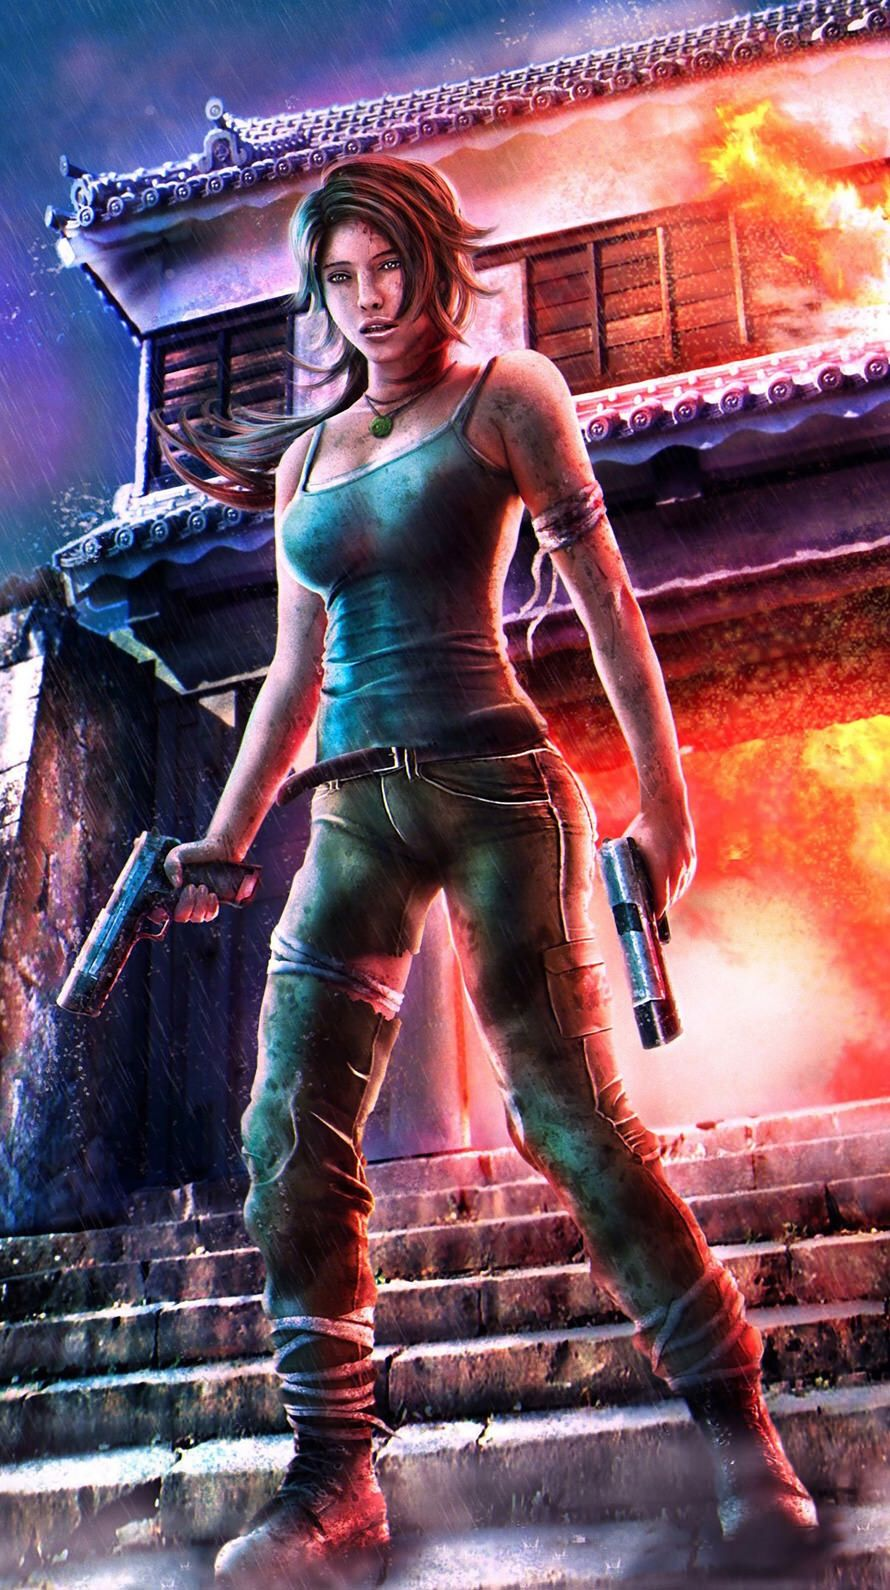 Pin by Morten Larsen on Lara Croft Tomb Raider | Tomb